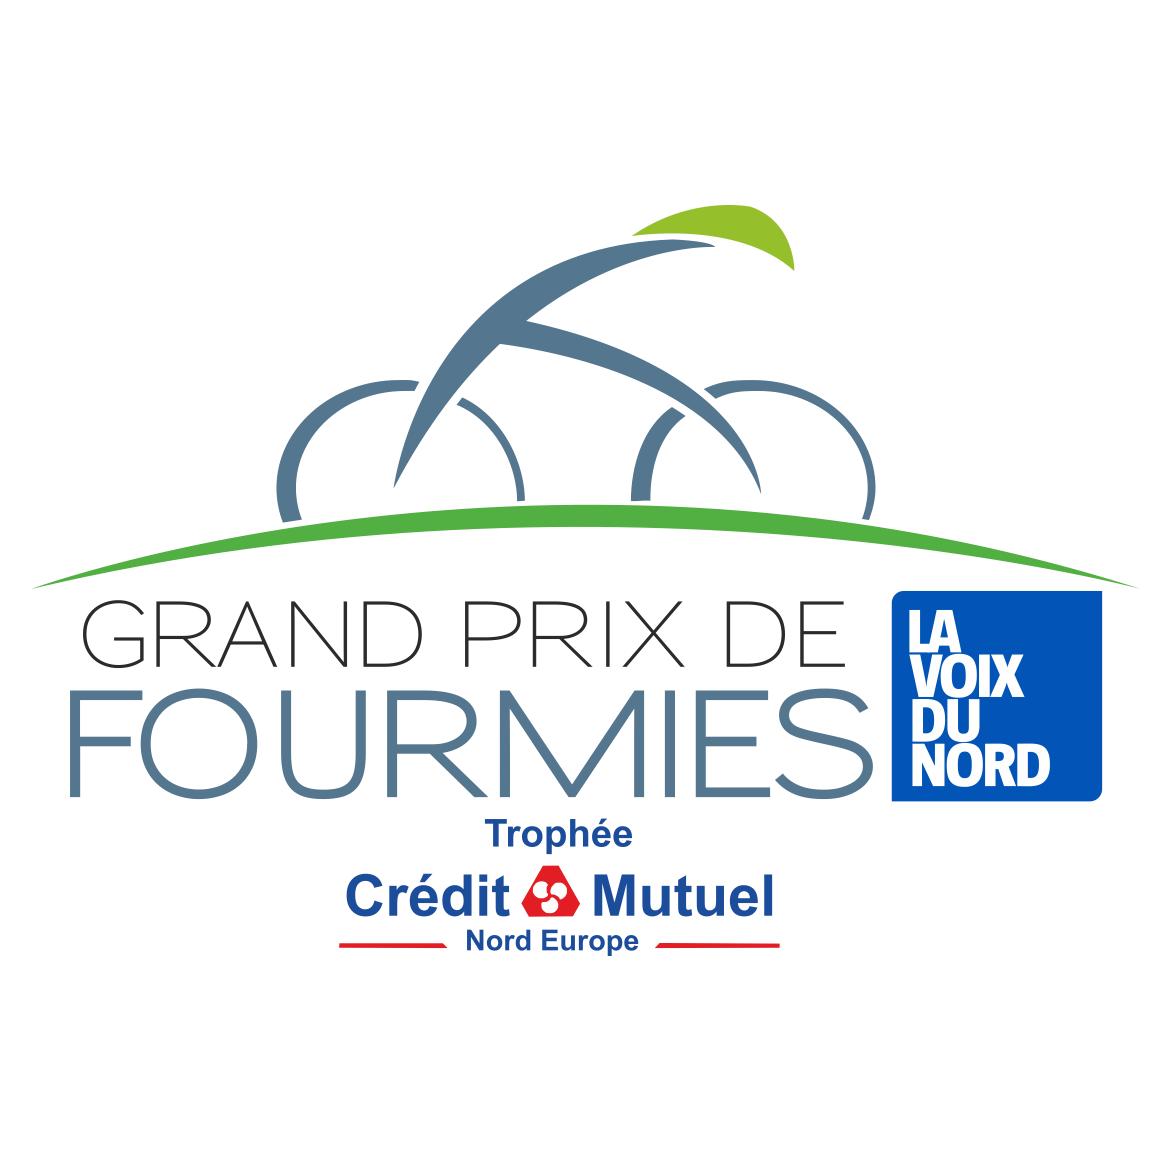 www.grandprixdefourmies.com